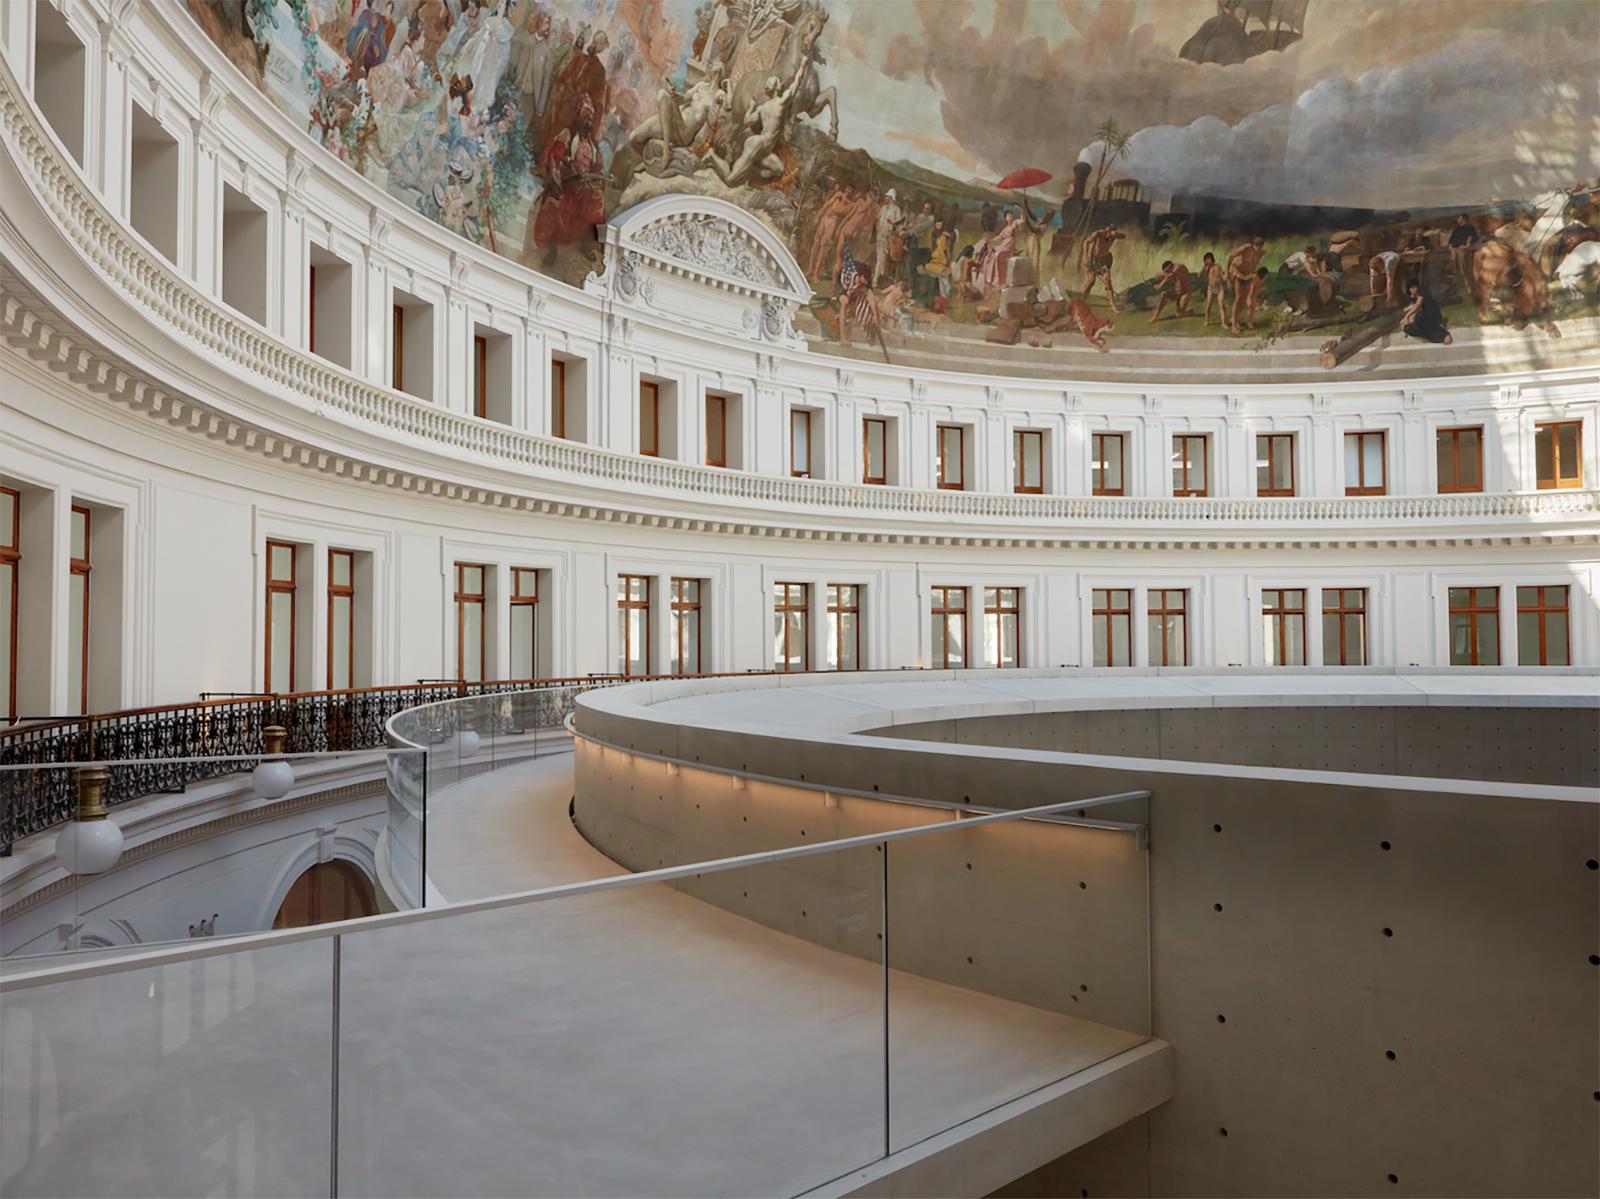 The Bourse de Commerce Gallery